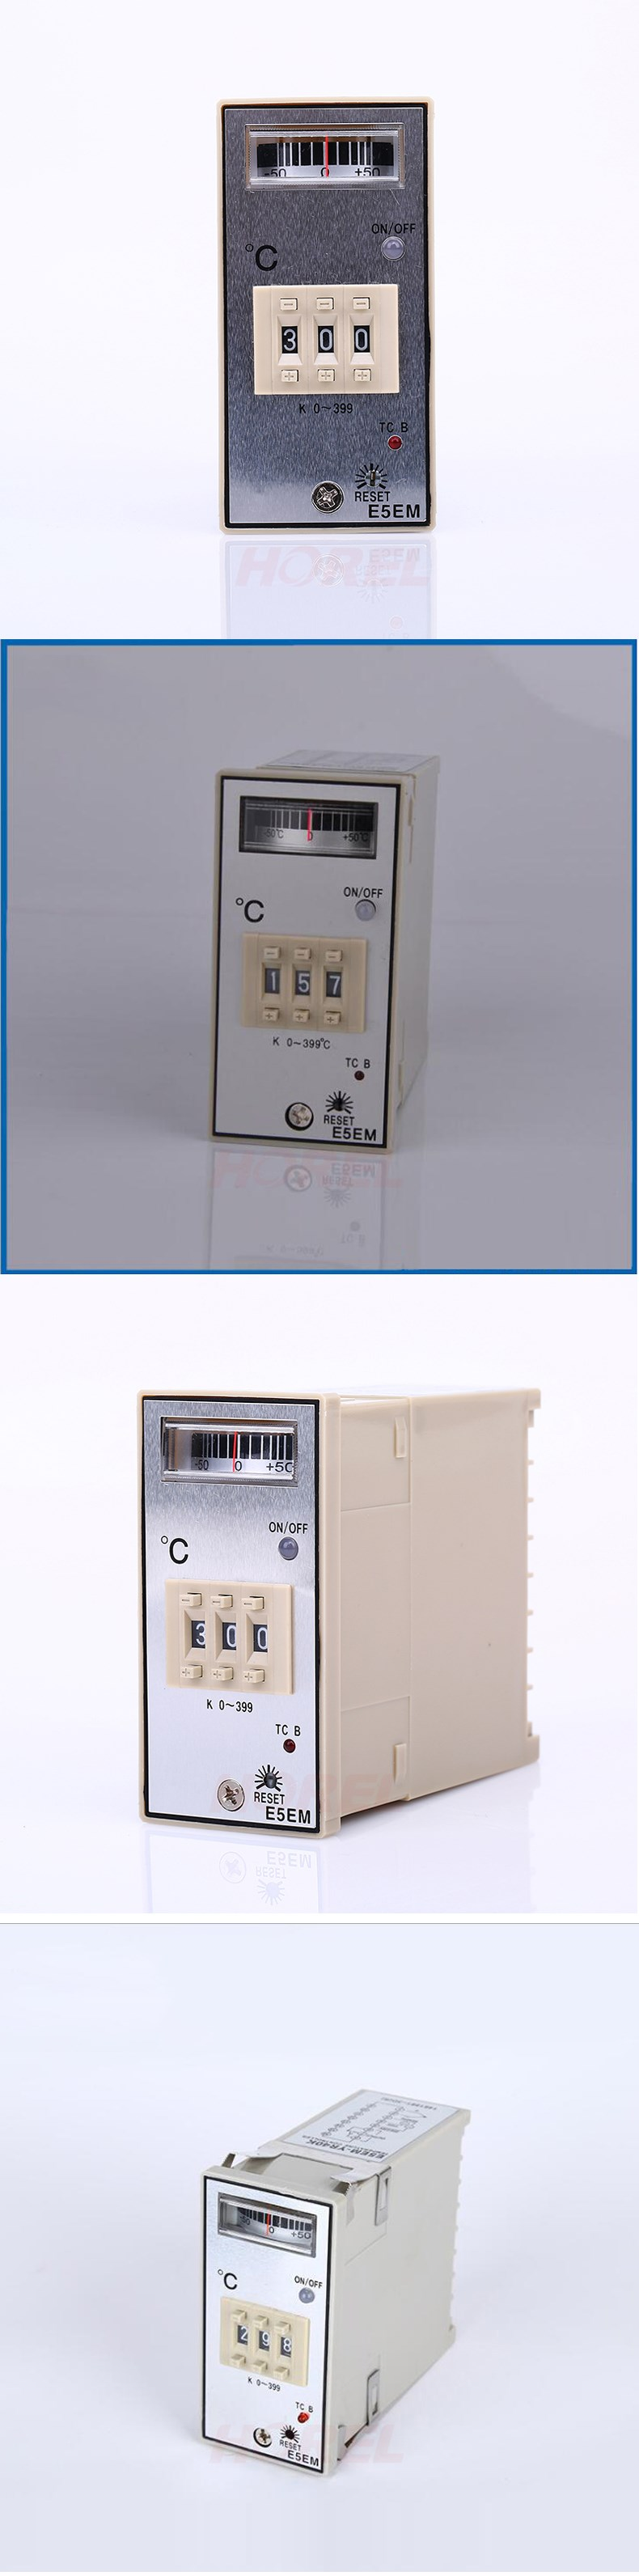 E5EM Temperature controller 1.jpg